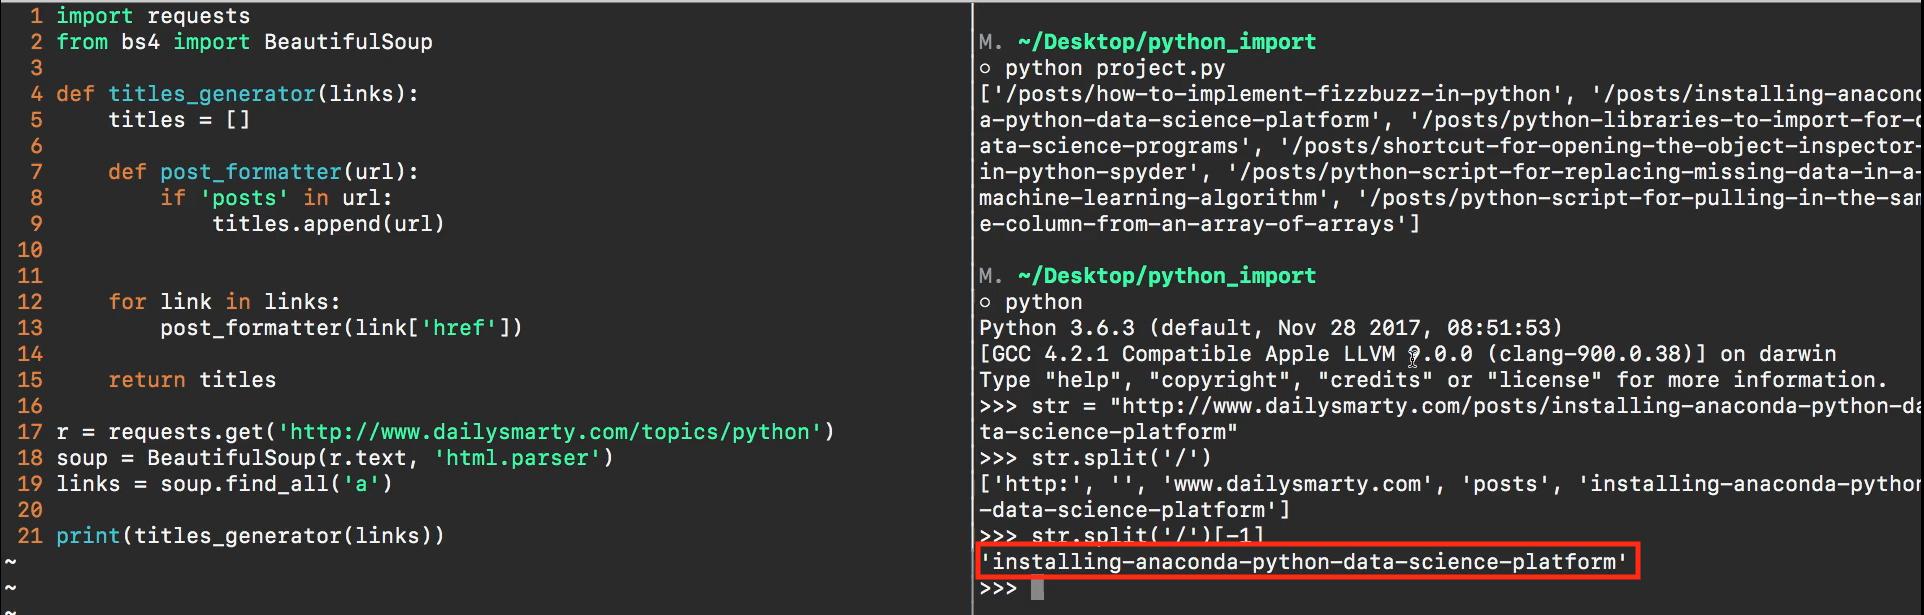 Project Solution: Build a Web Scraper in Python